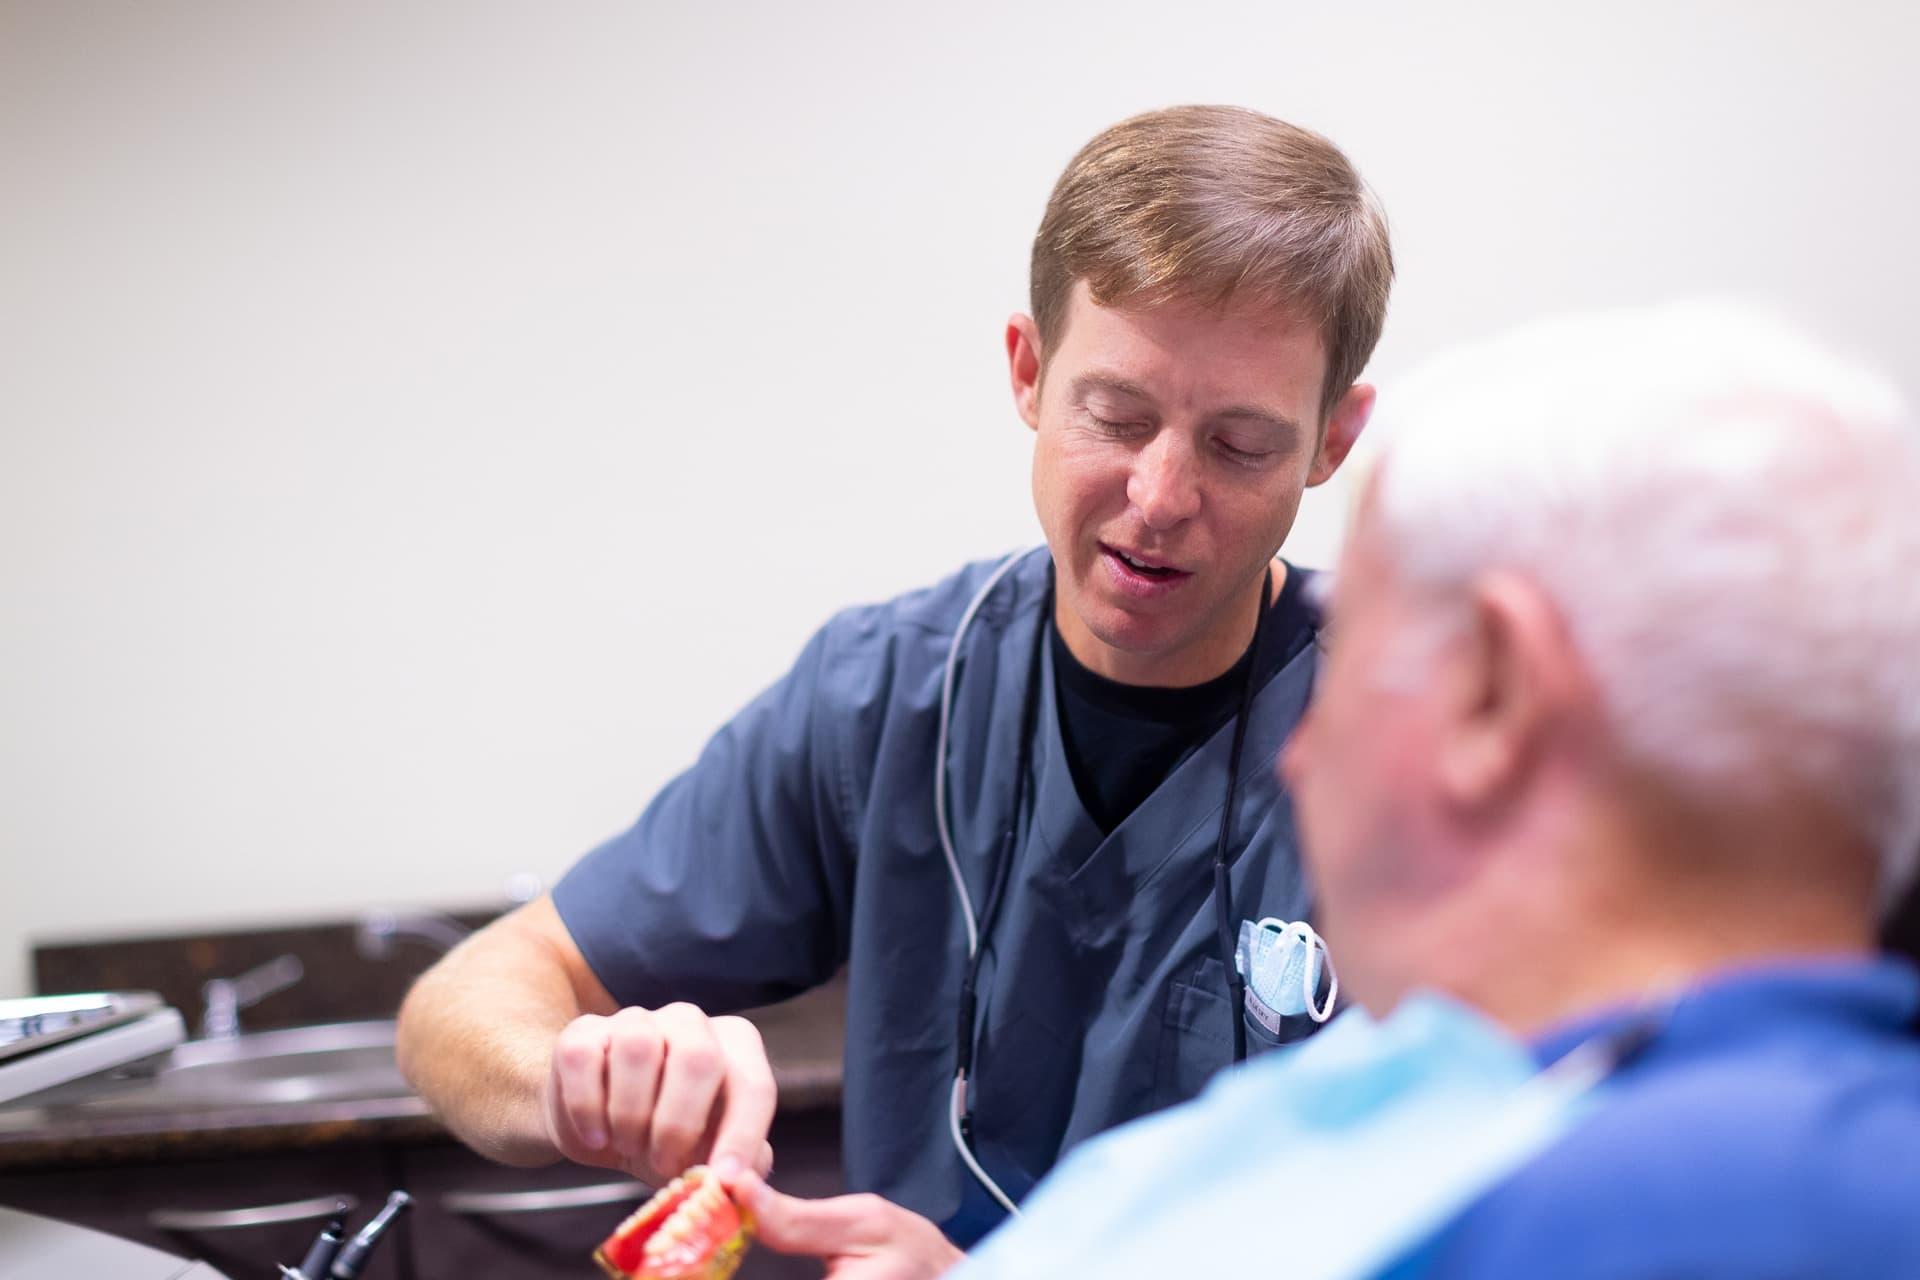 dr. fergus wisener cooper fergus dds dentist in rogers ar 2019 2 - Dentures & Partial Dentures